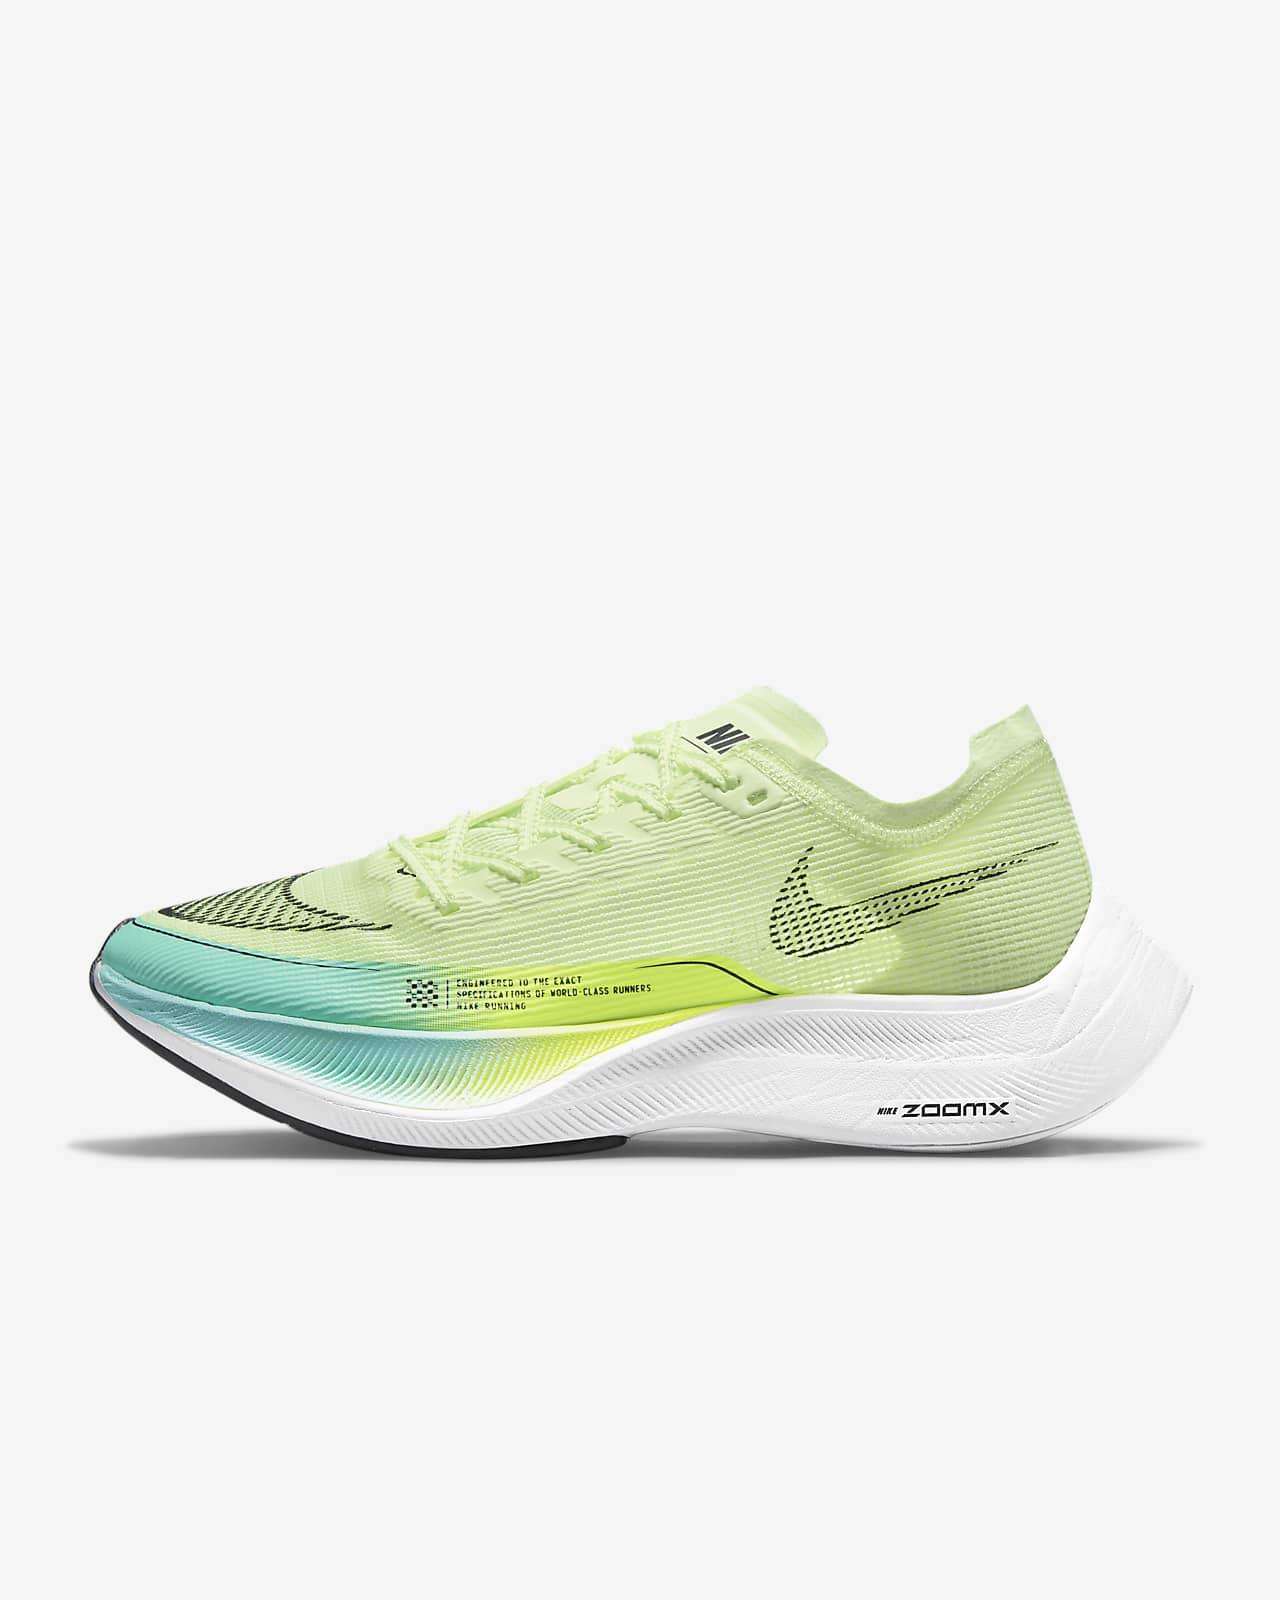 Scarpa da gara su strada Nike ZoomX Vaporfly Next% 2 - Donna